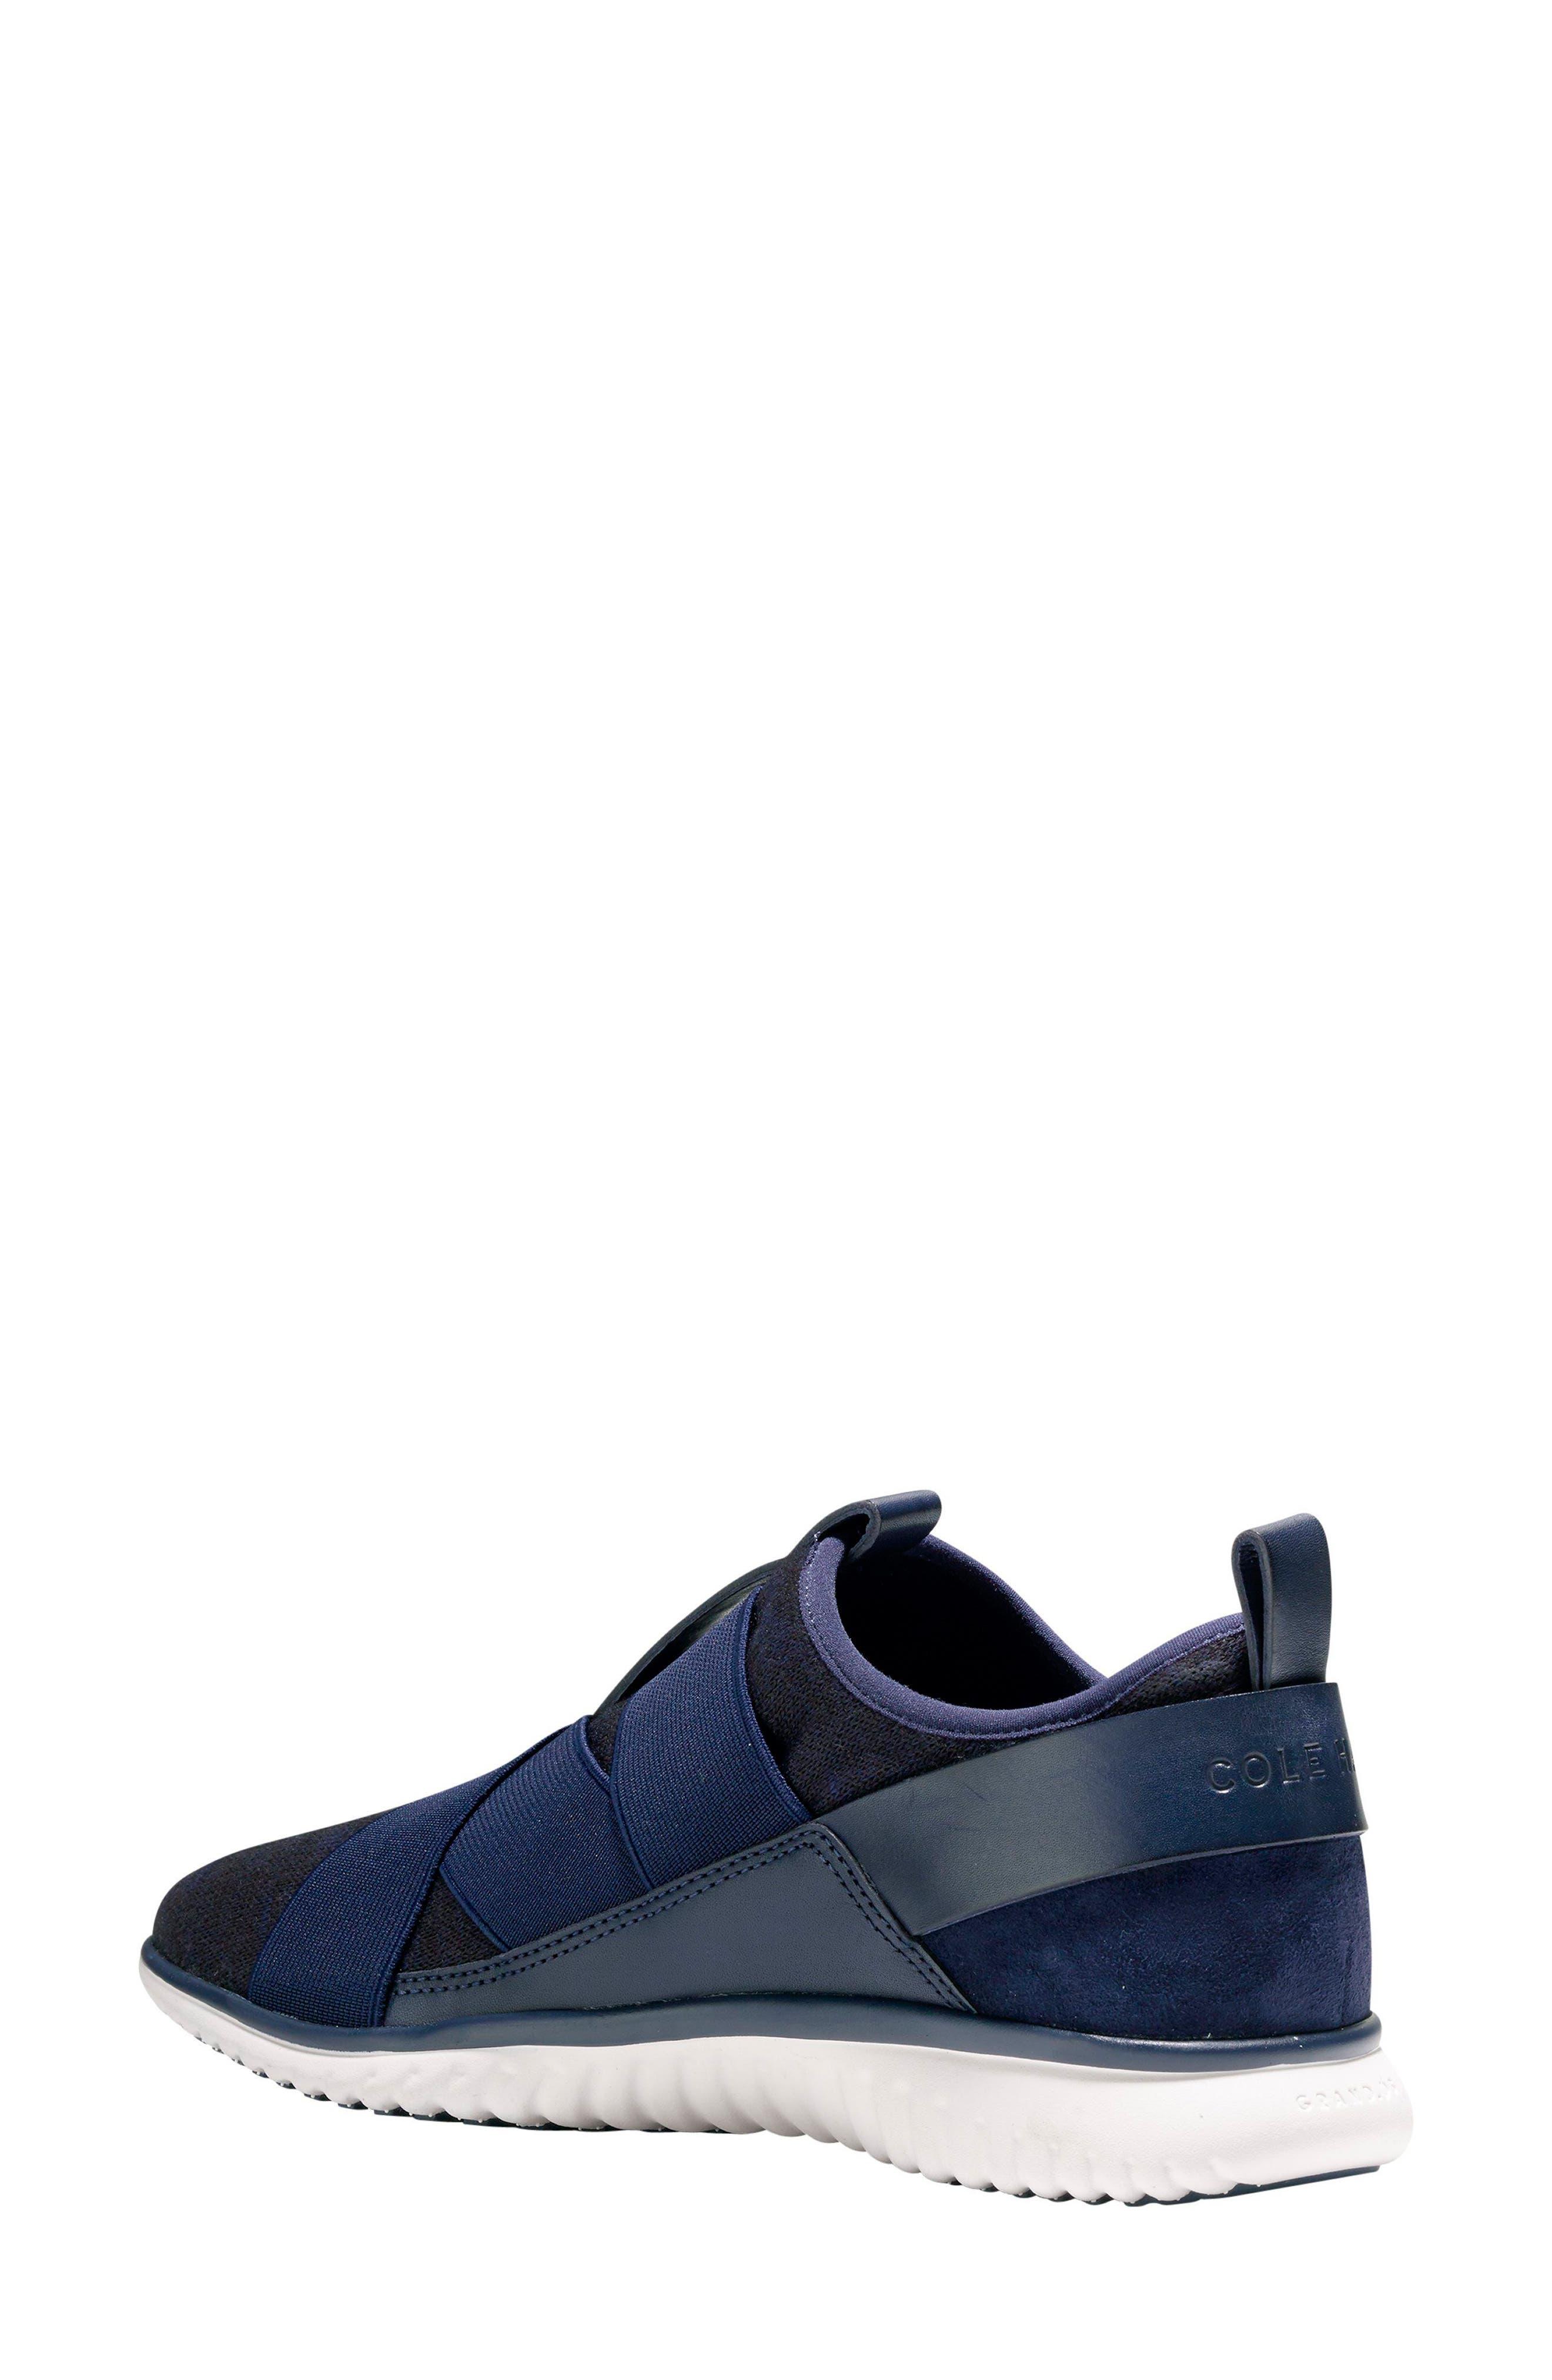 'StudioGrand' Sneaker,                             Alternate thumbnail 14, color,